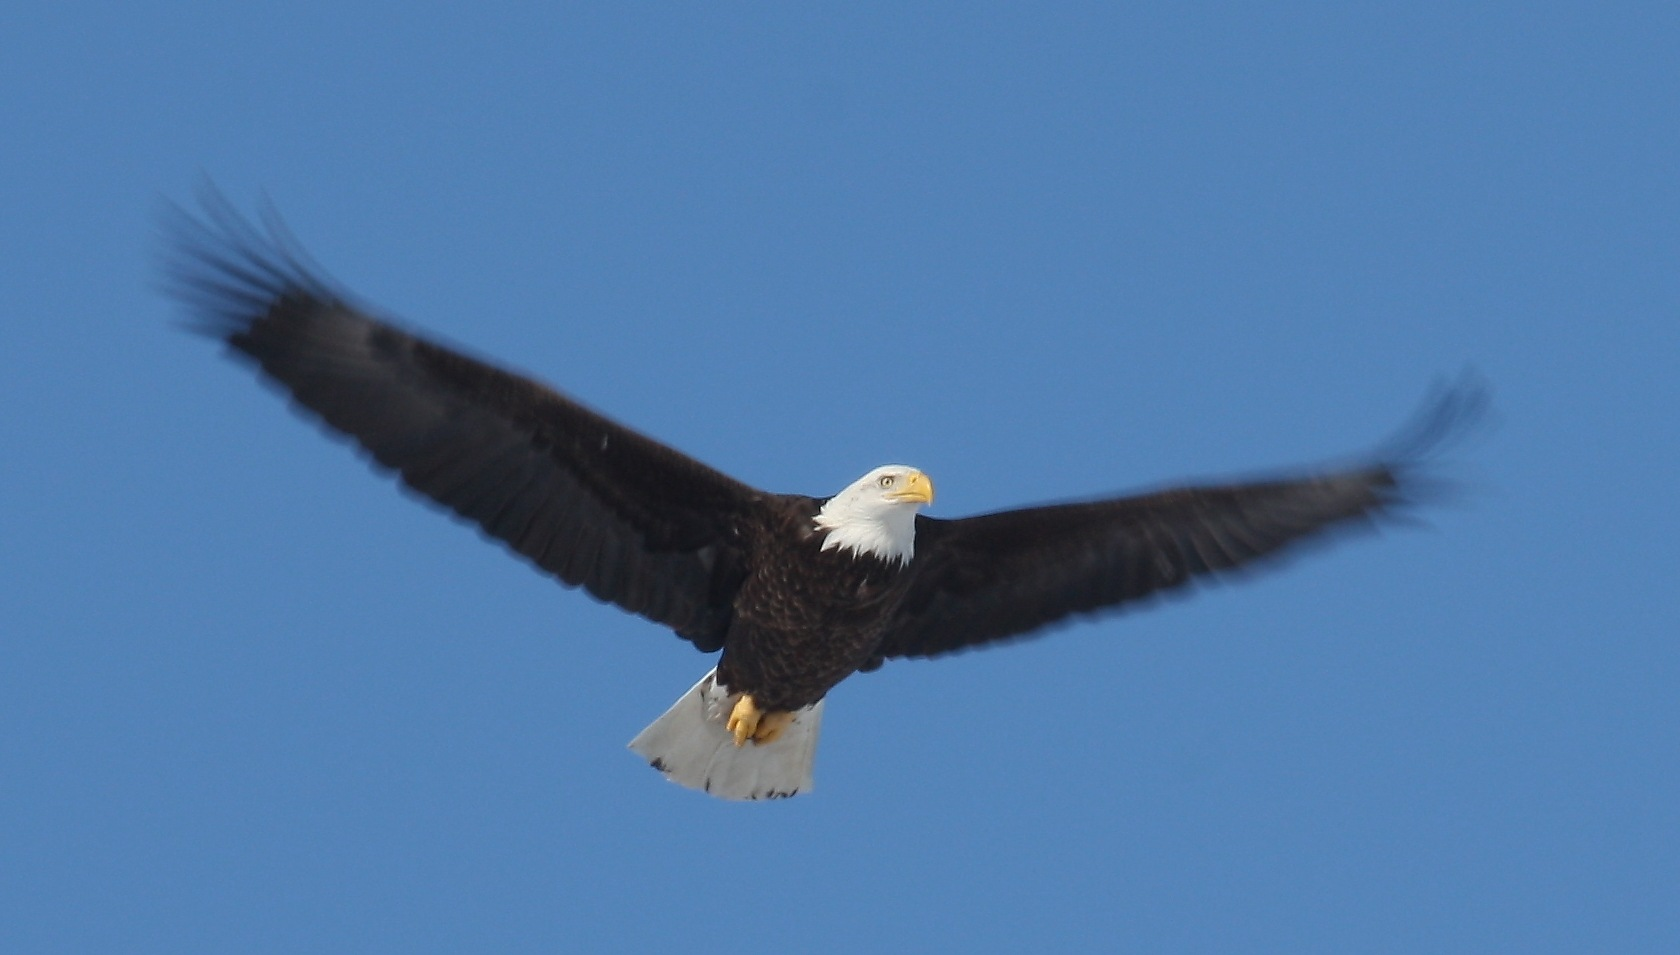 Bald eagles in flight - photo#15